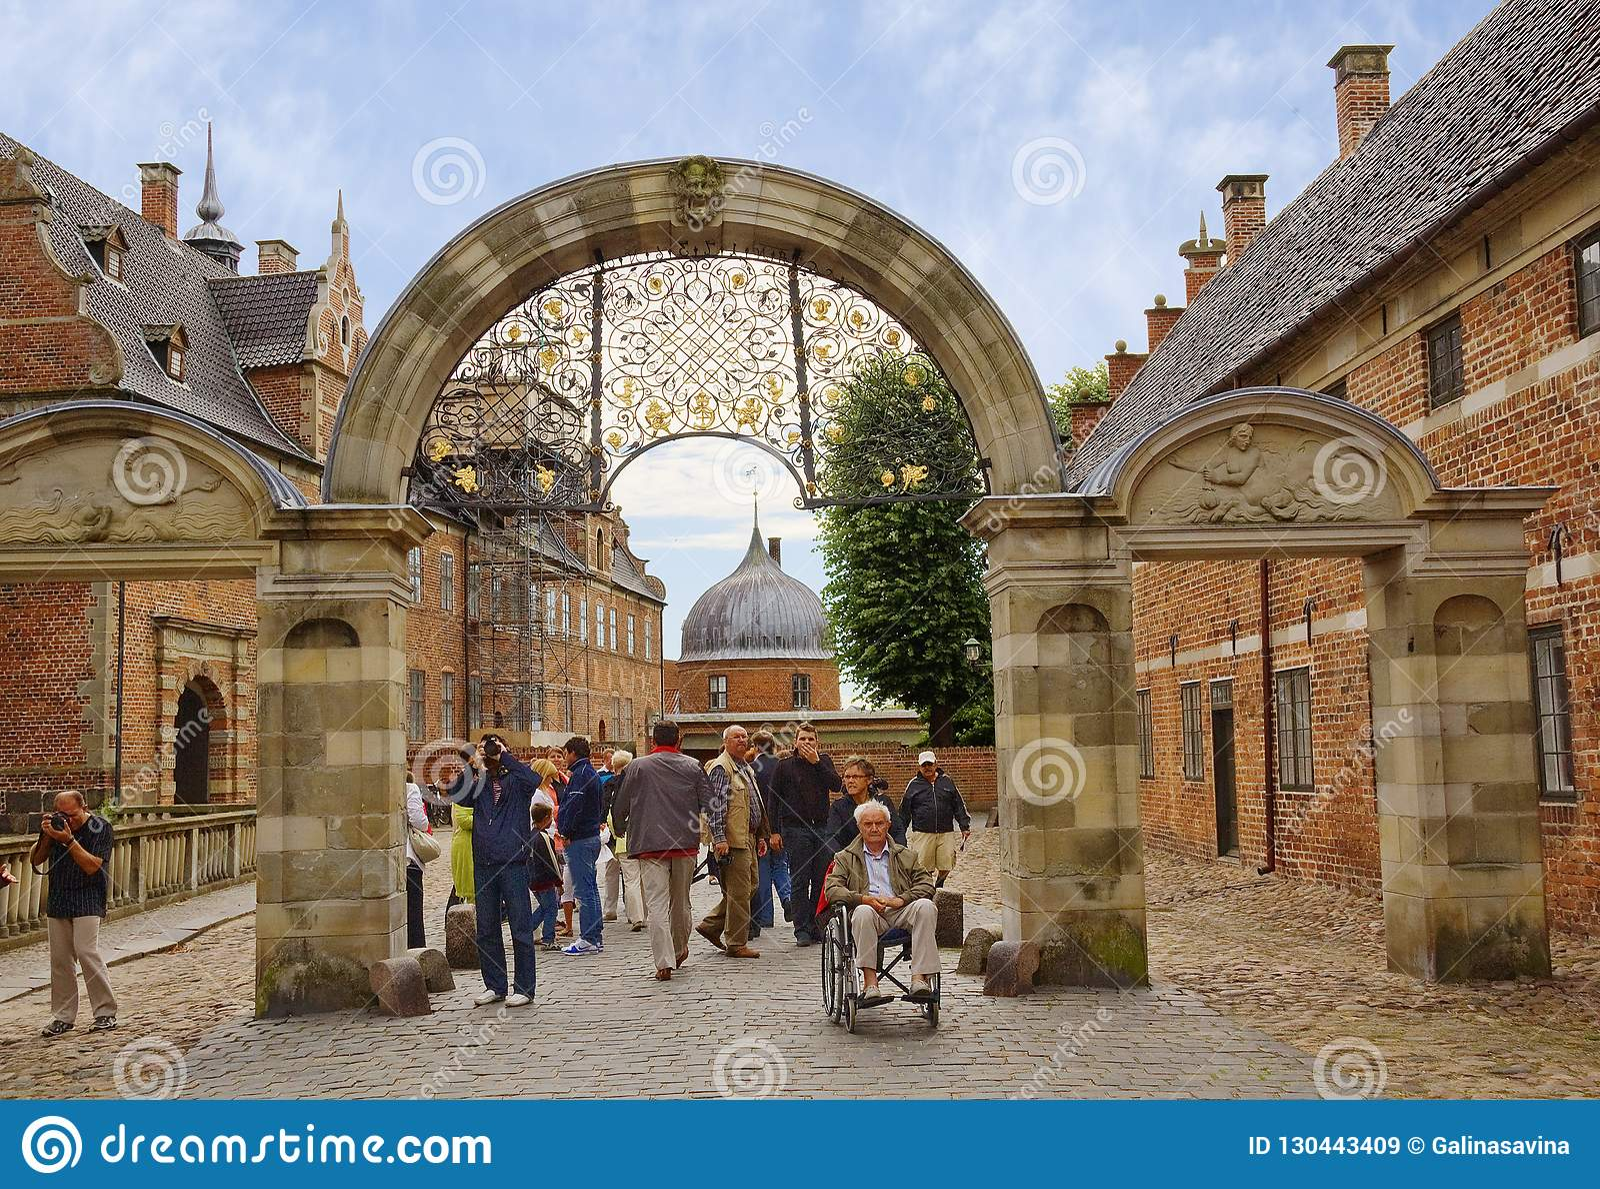 Kopenhagen Dänemark Dargestellter Bogen In Frederiksborg Schloss